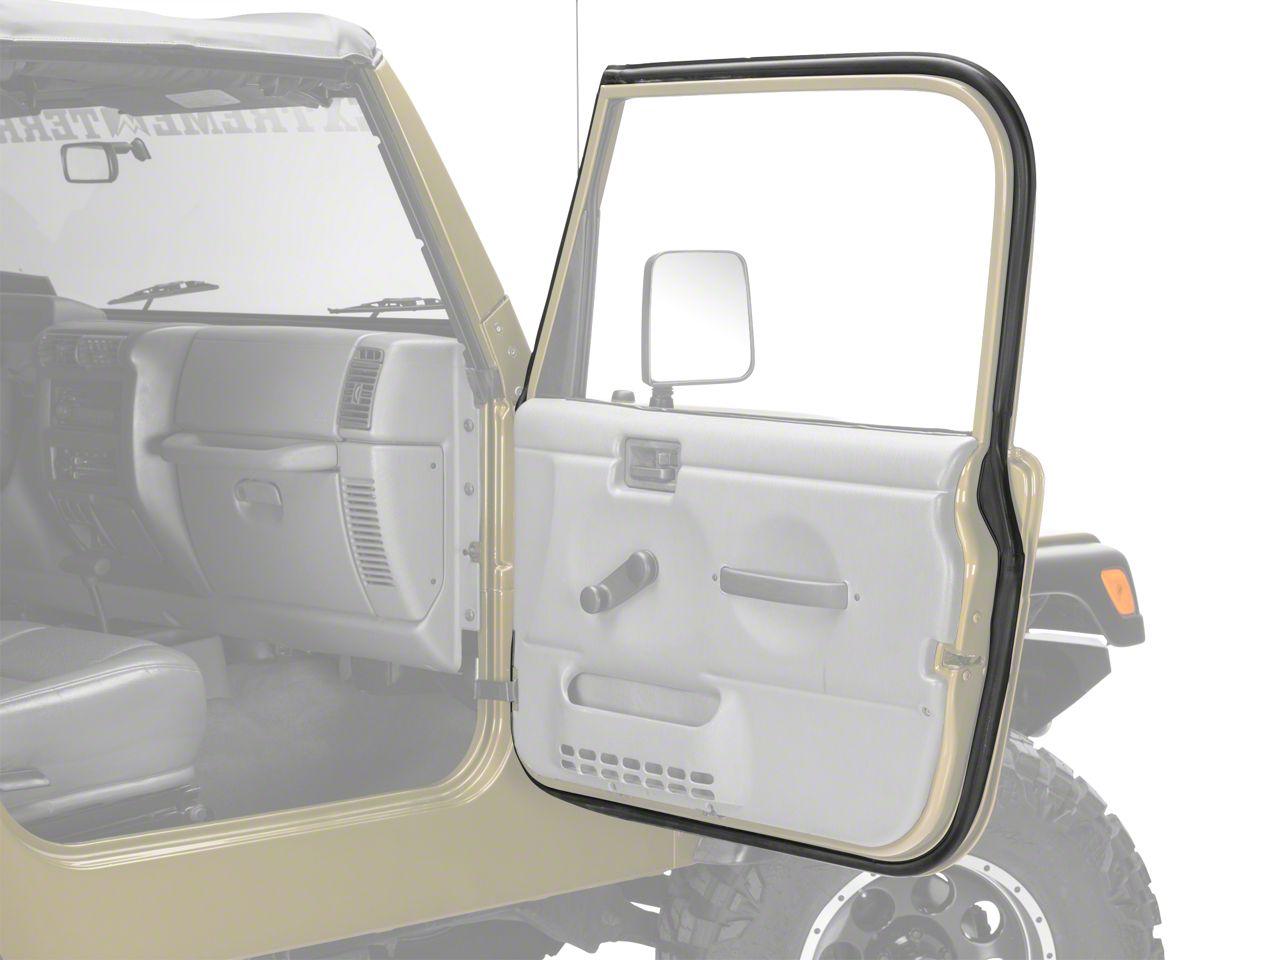 Passenger Outer Door Weather Stripping (97-06 Jeep Wrangler TJ w/ Full Doors)